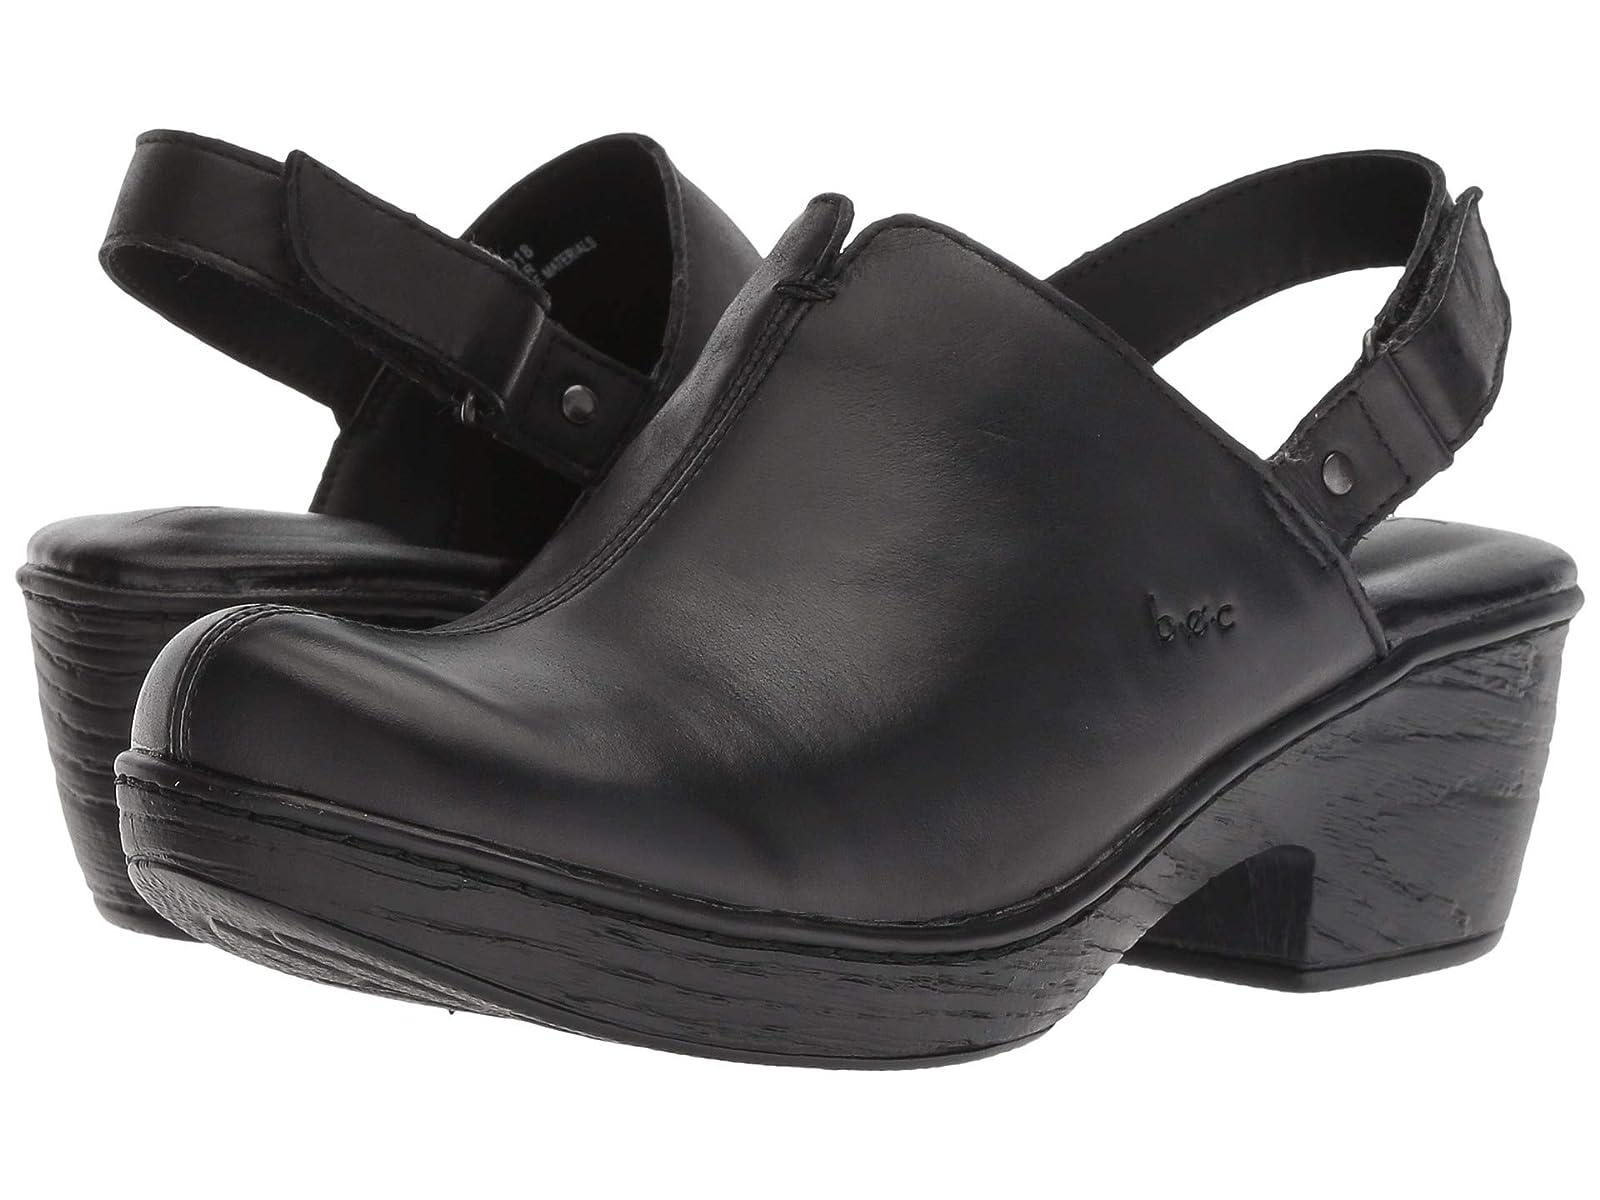 b.o.c. AimeCheap and distinctive eye-catching shoes